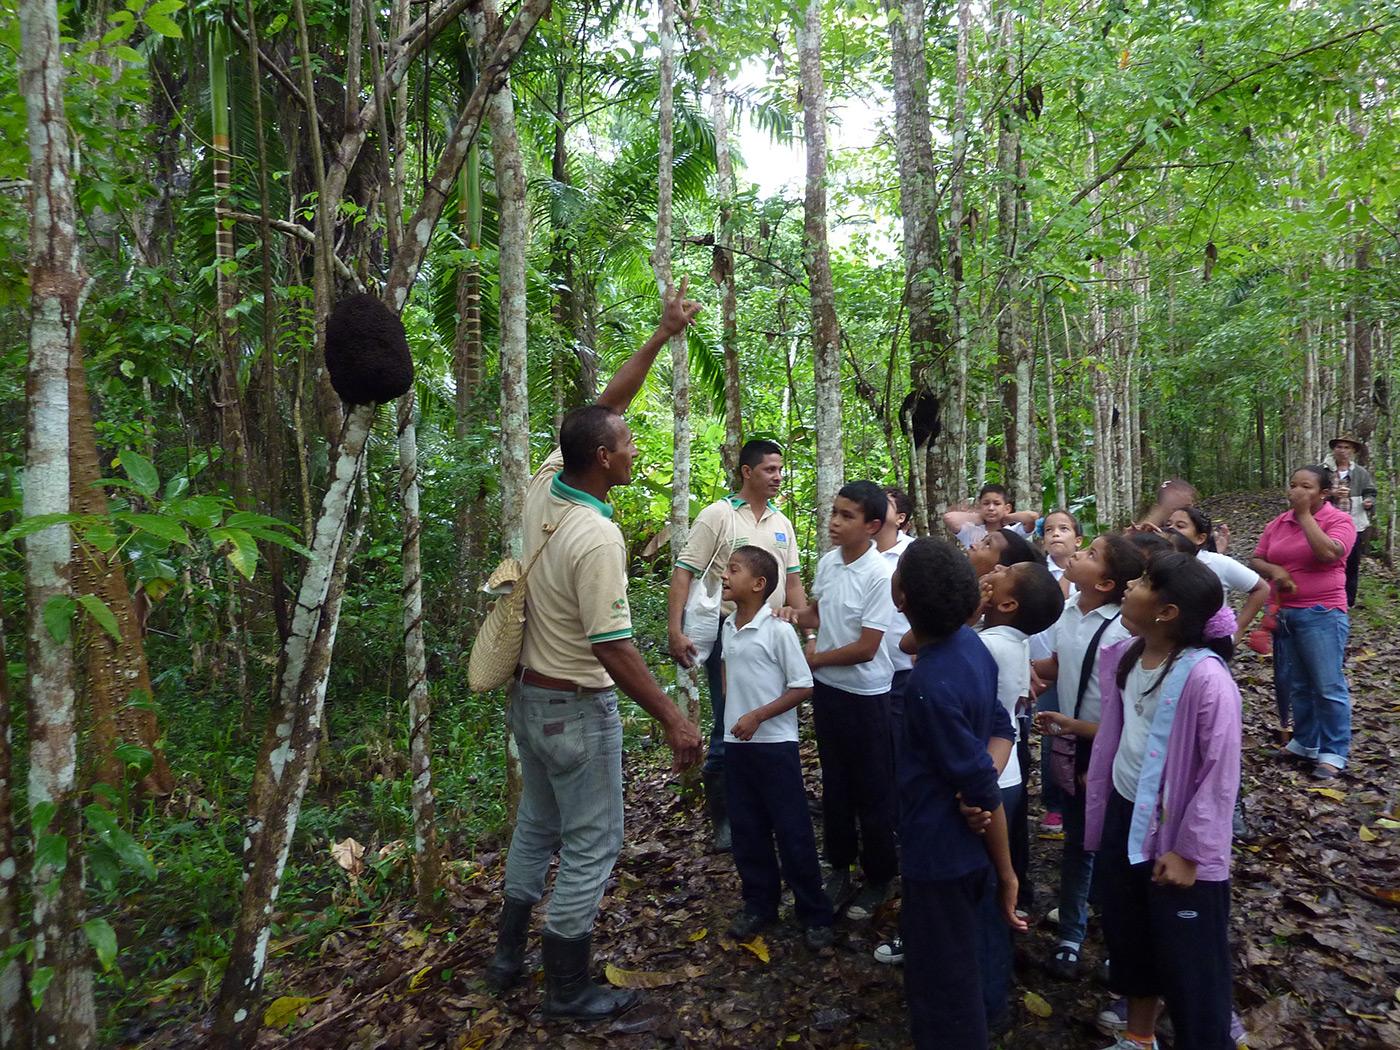 Umweltbildung Venezuela © OroVerde / E. Mannigel